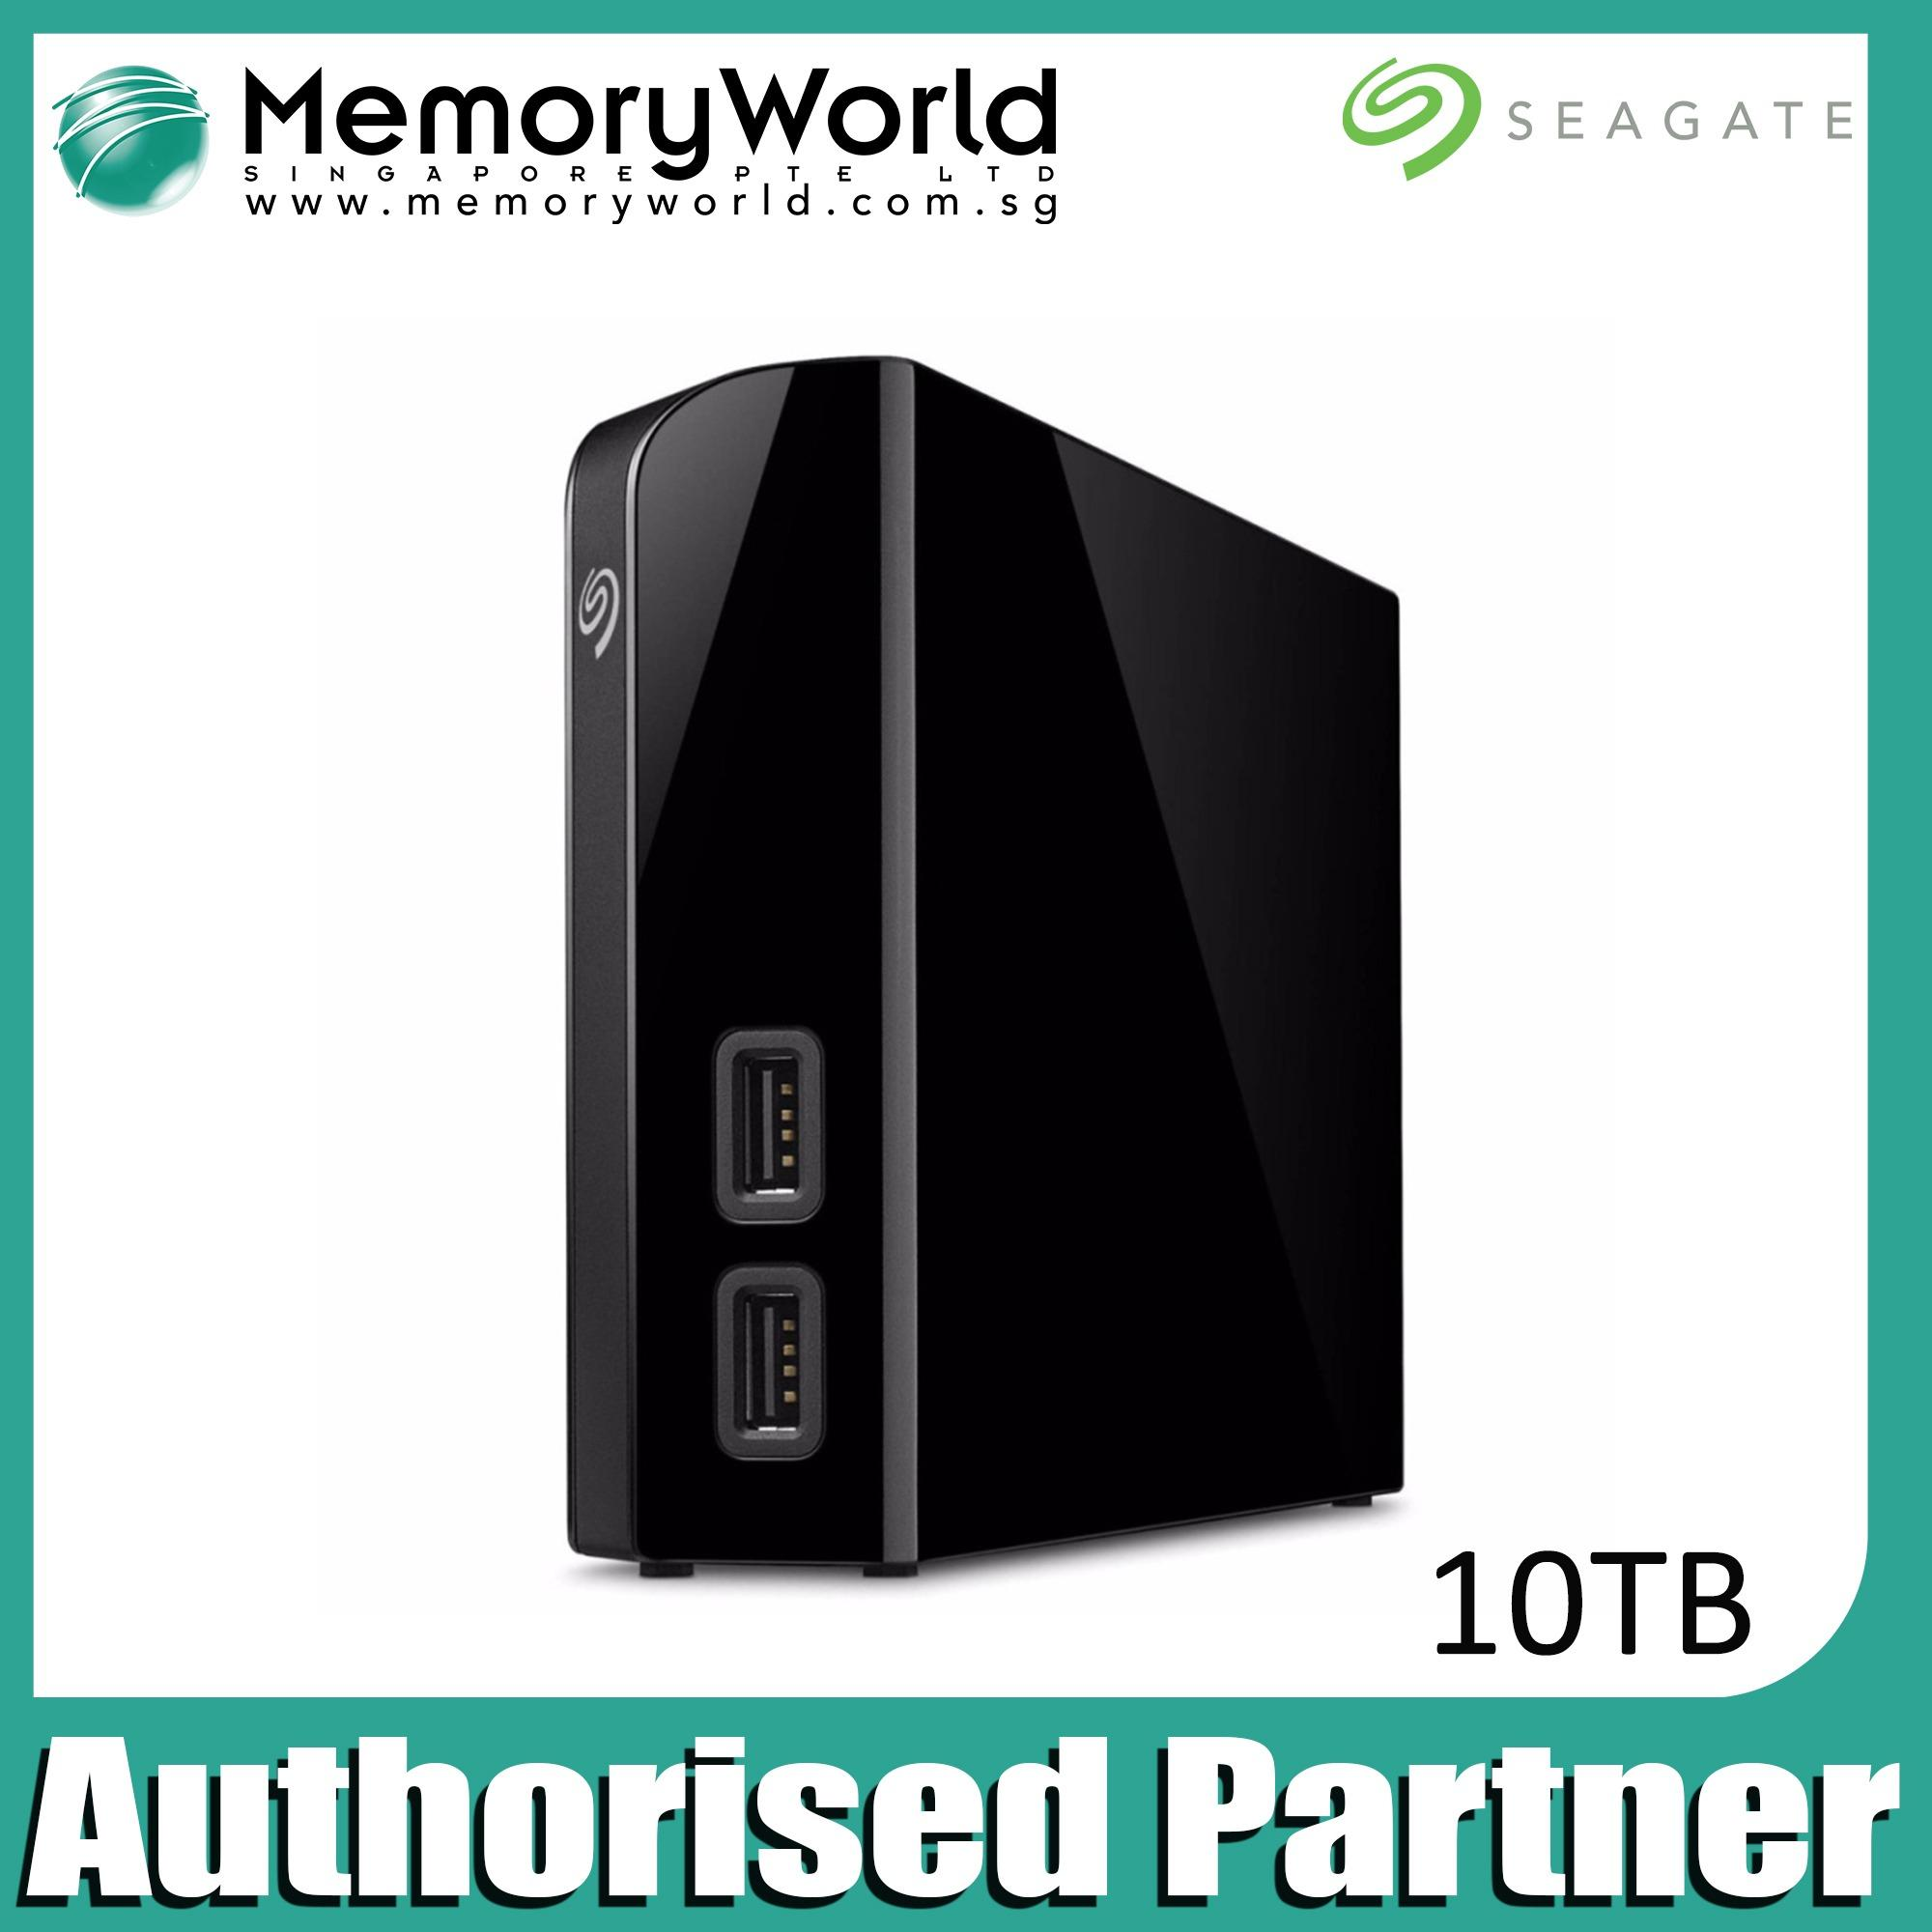 Seagate 10Tb Backup Plus Desktop Drive With Hub On Singapore